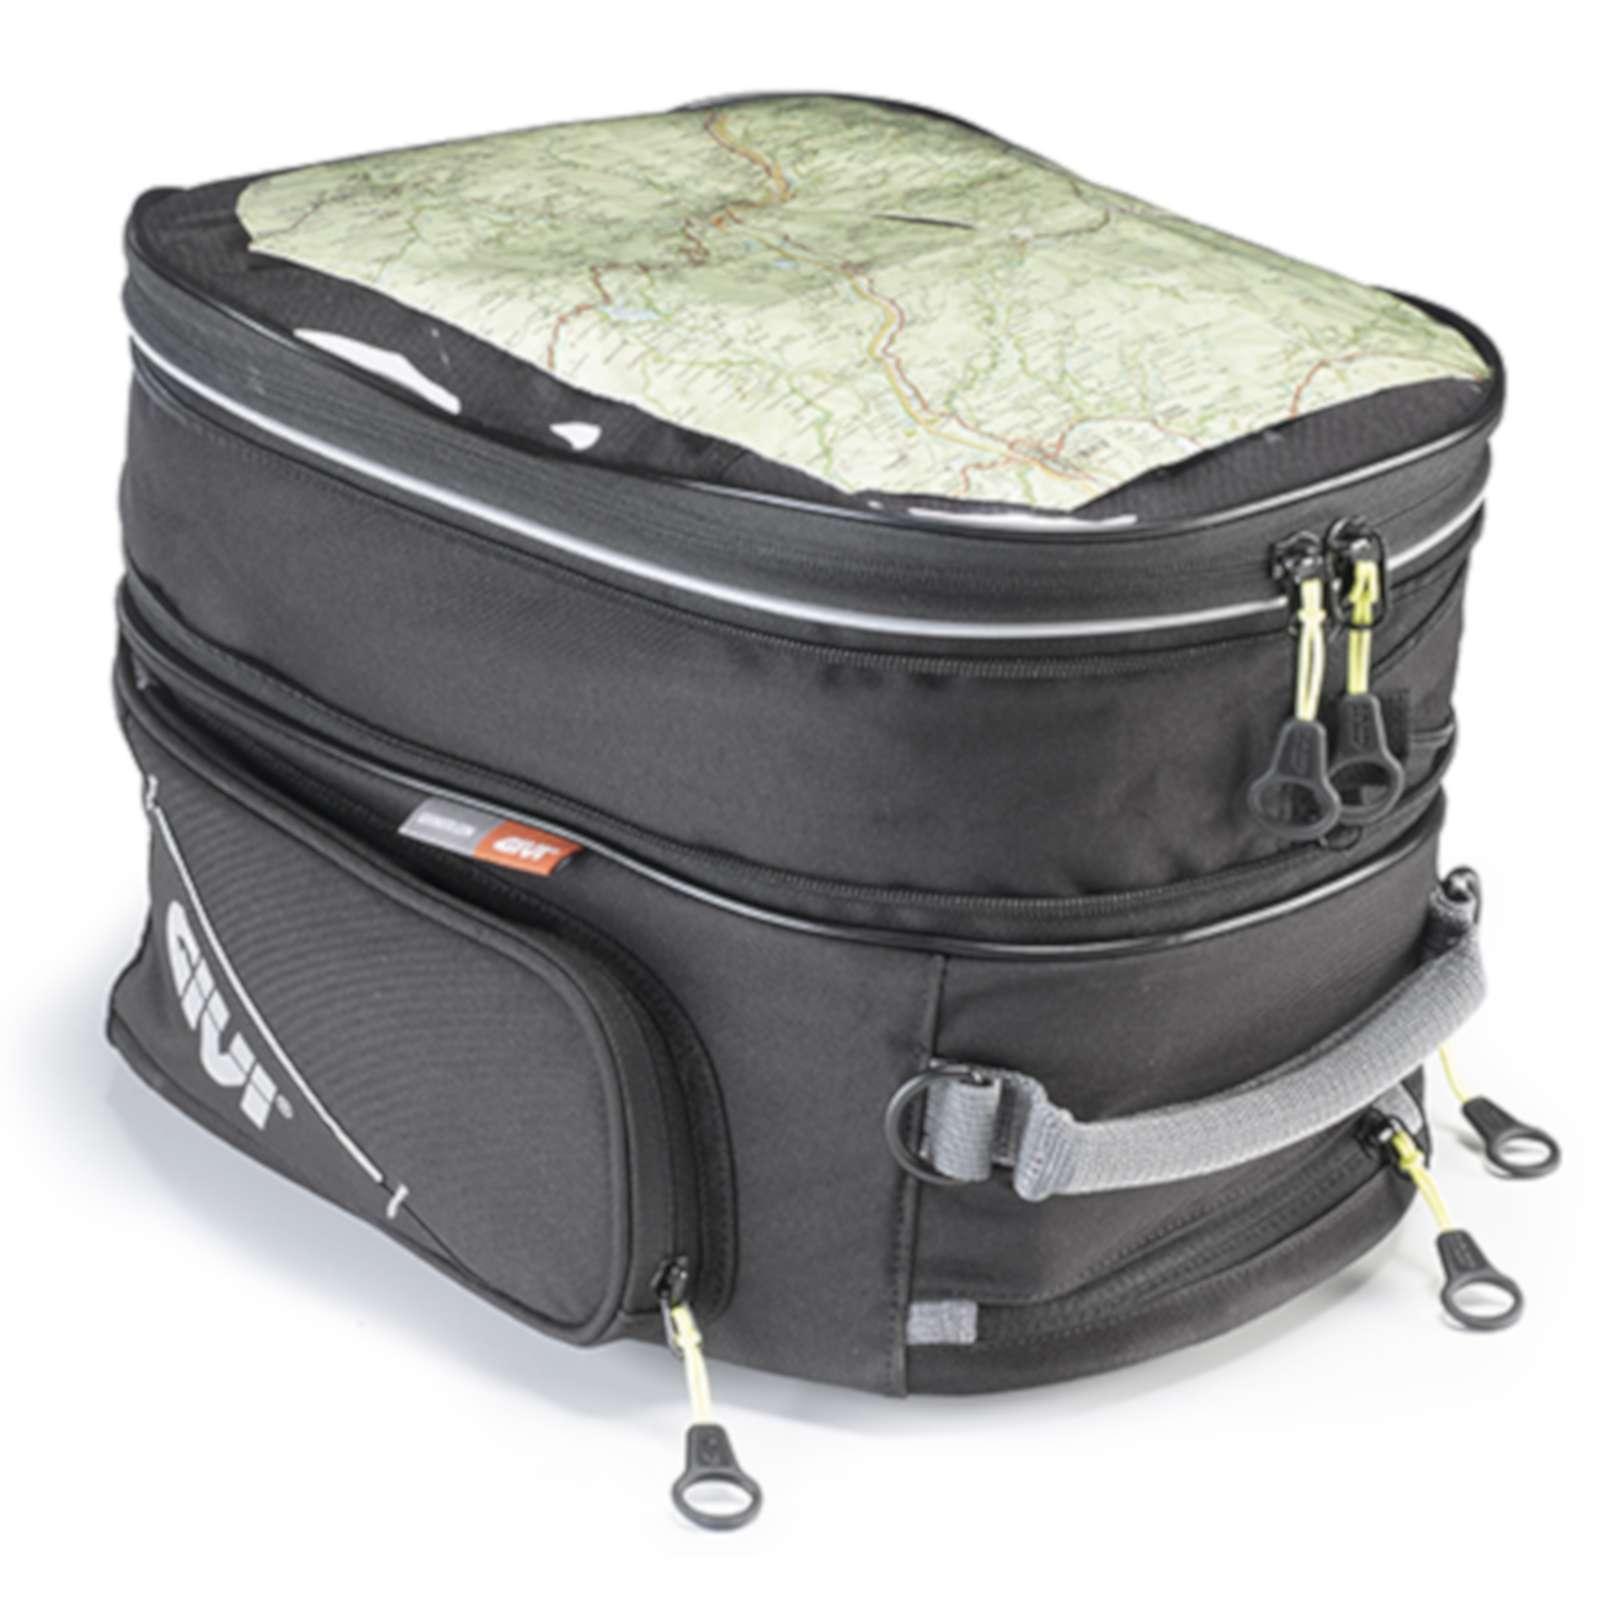 714deee6fe7 Givi EA117 Tanklock Motorcycle Motorbike Tank Bag Inc Rain Cover - 26 Litre